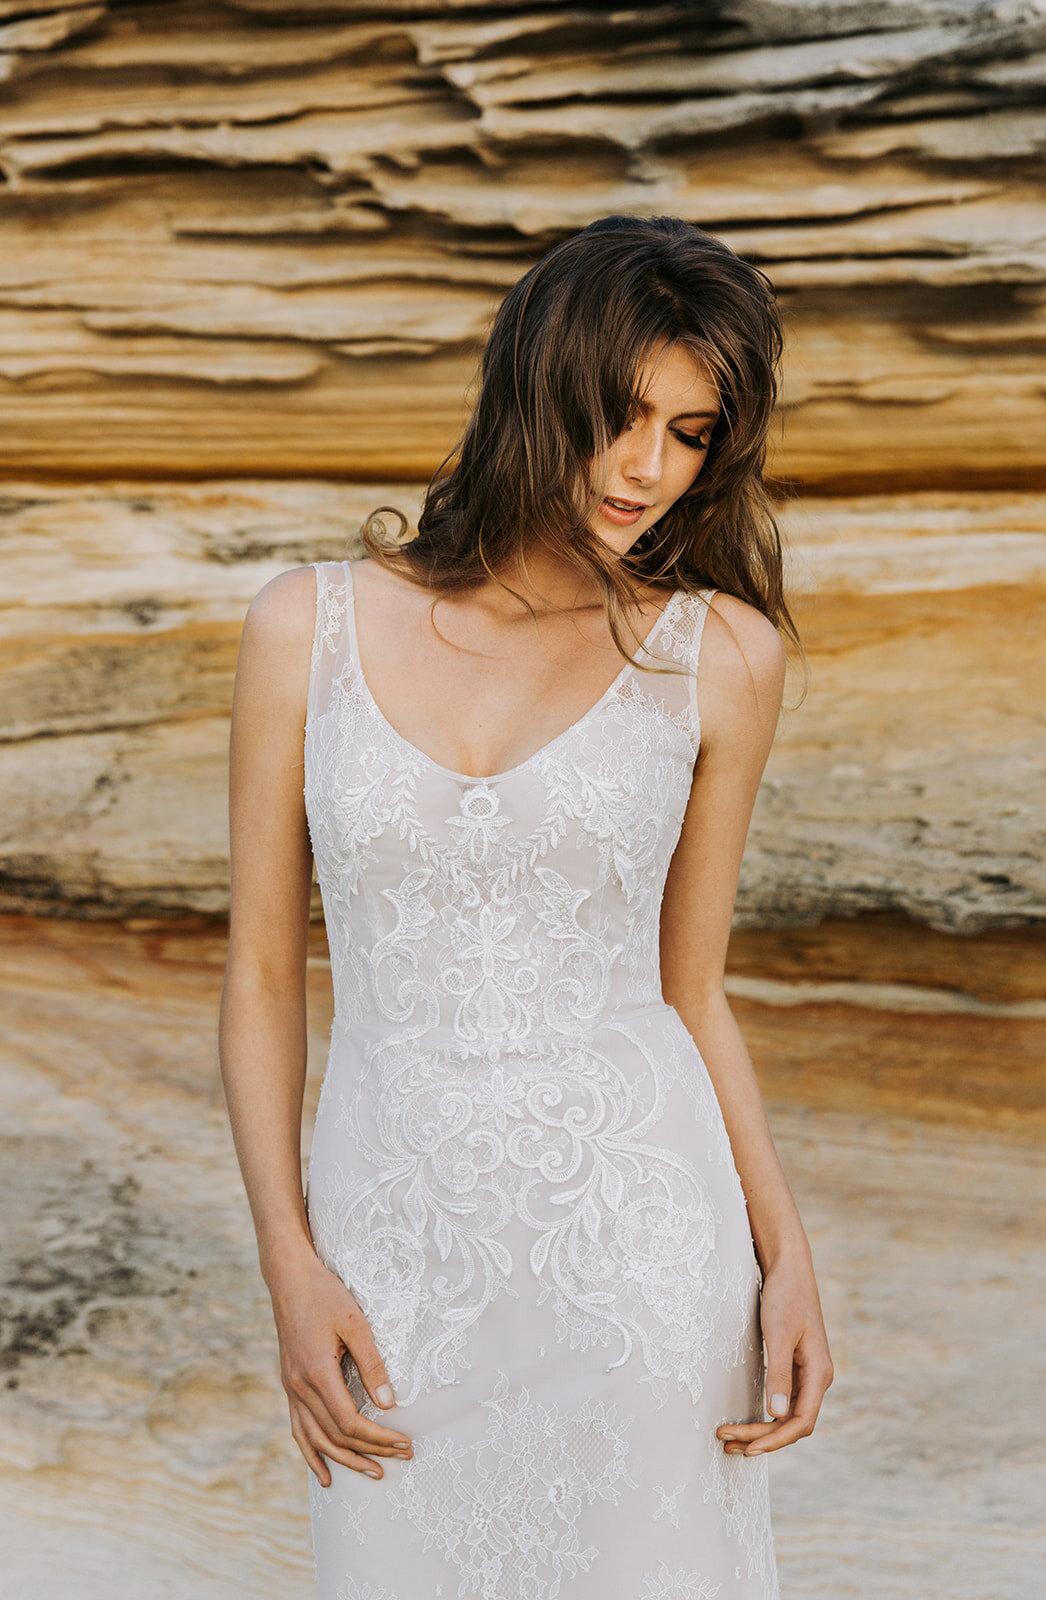 Tanya Anic Bridal & Event Wear